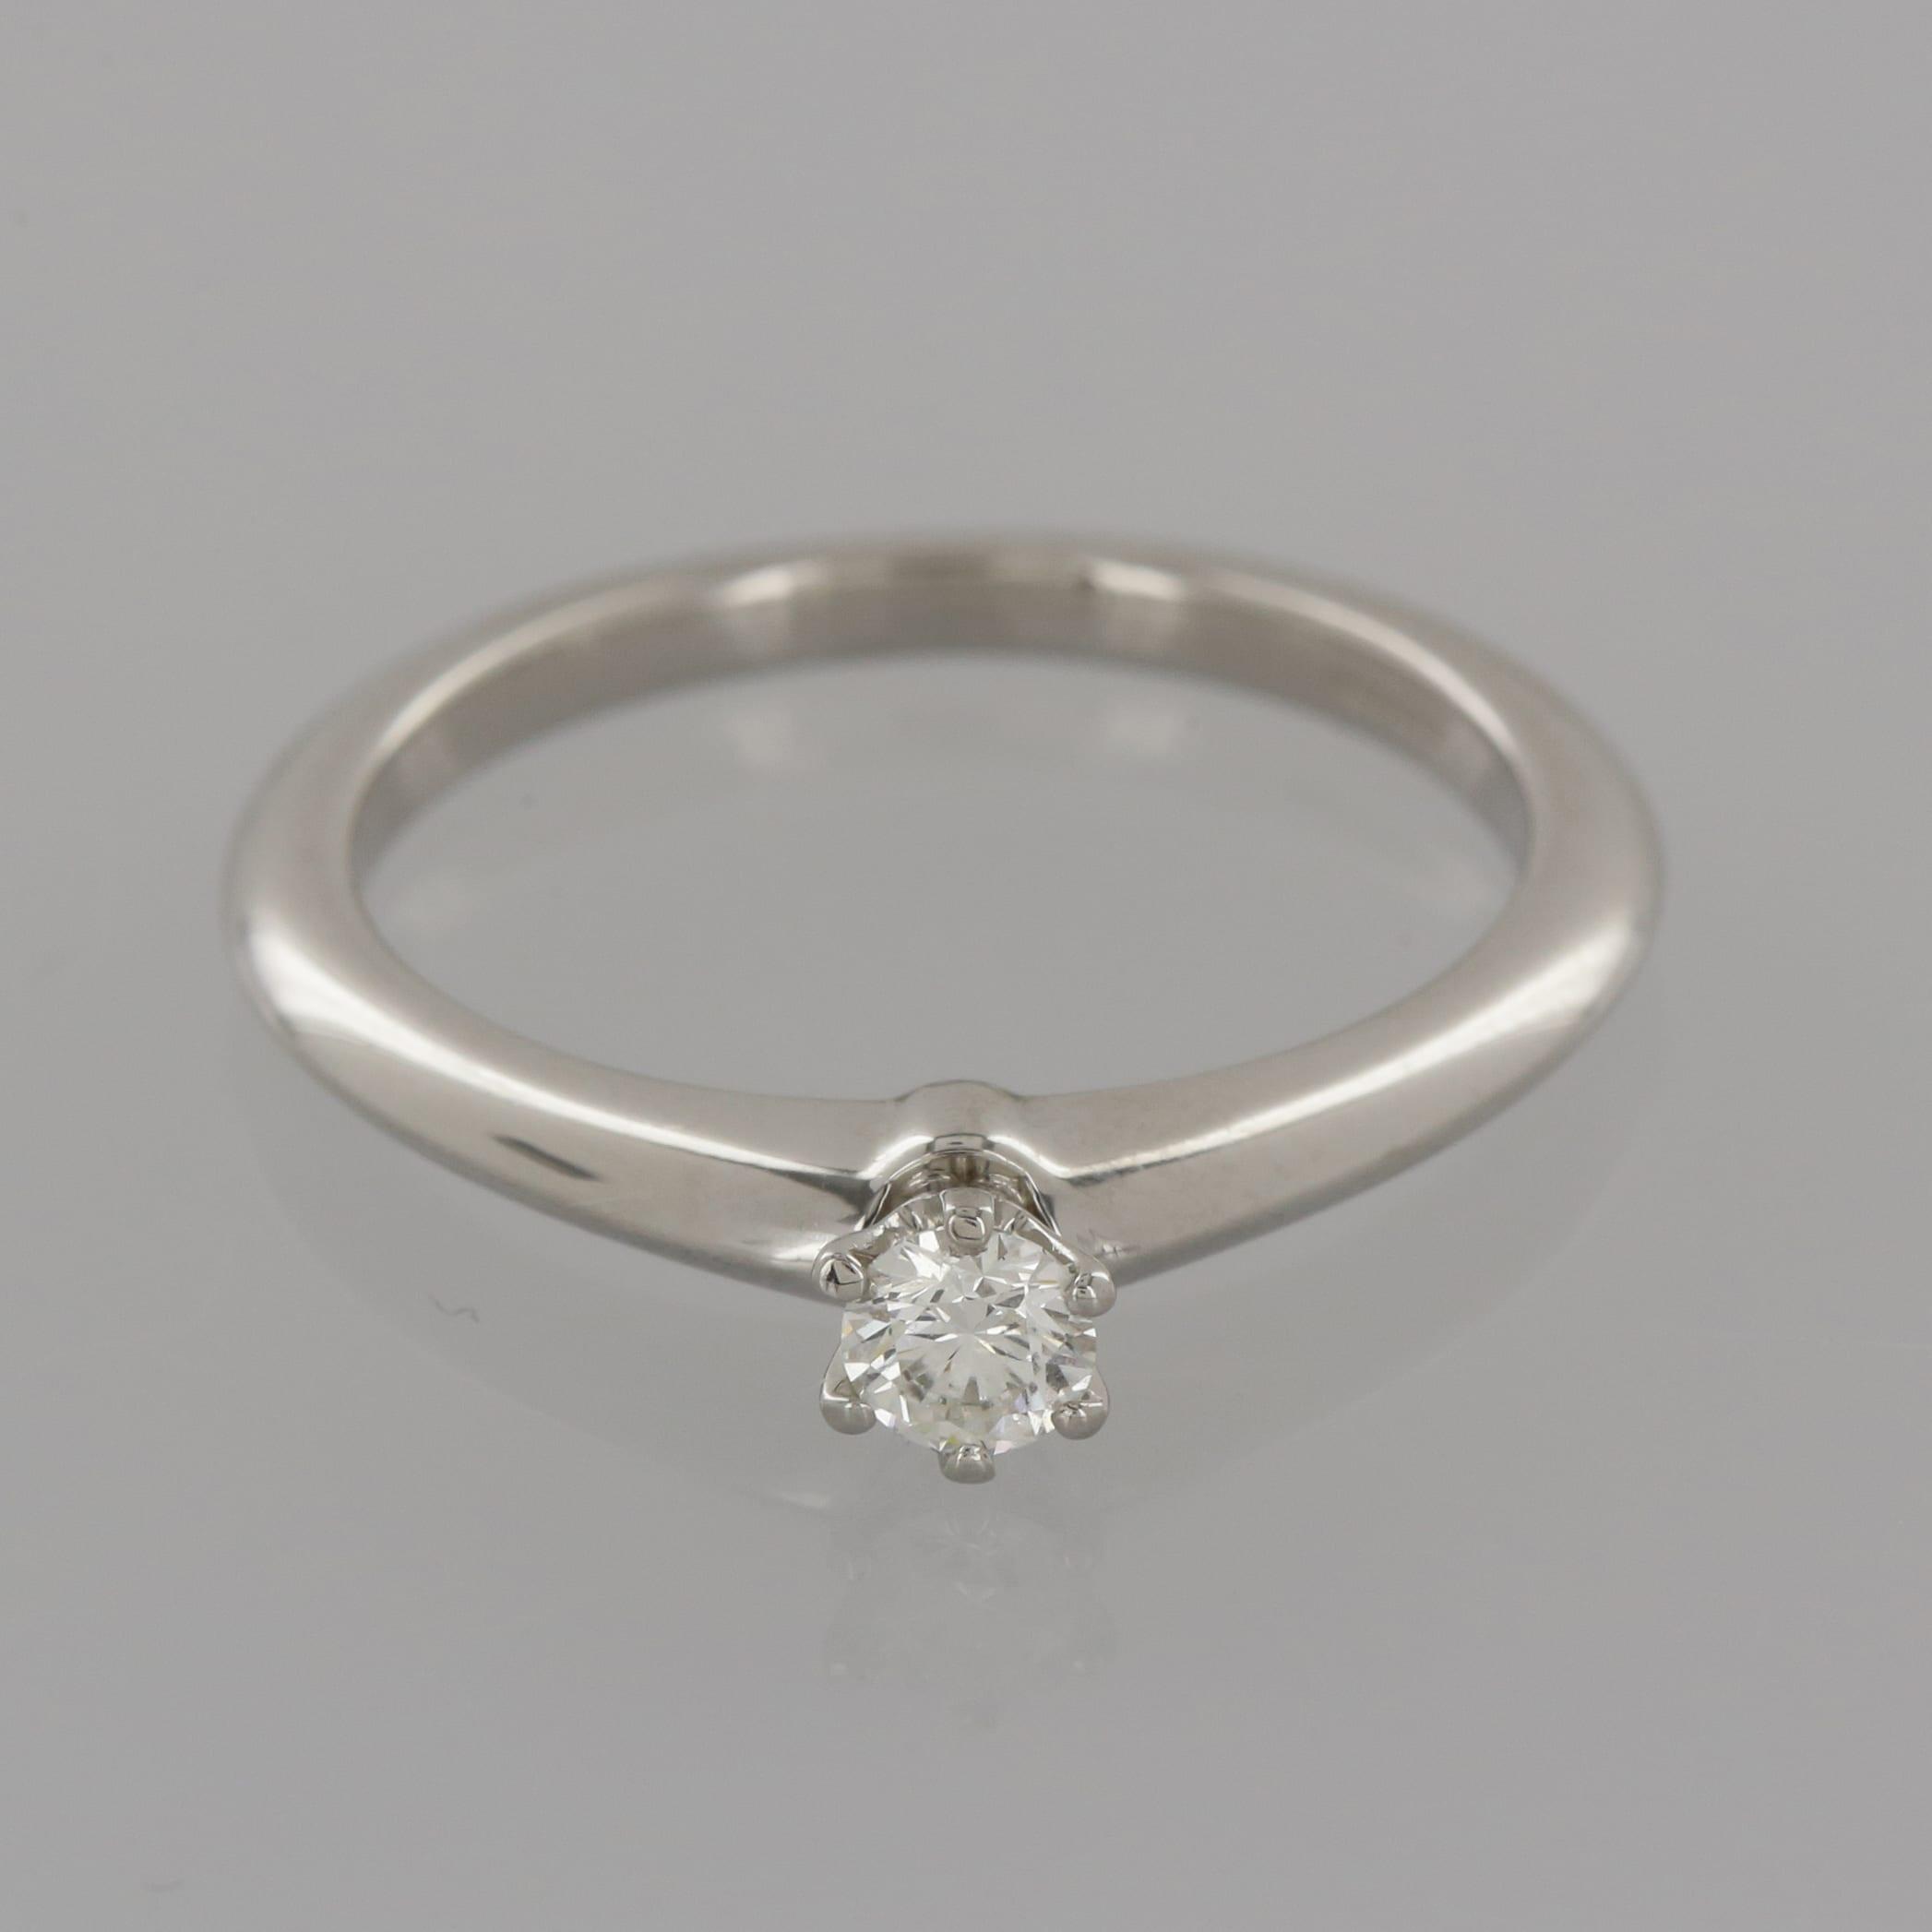 2d5760e0d Home / Rings / Stone / Diamond / Tiffany & Co. 0.19 Carat Diamond Solitaire  Engagement Ring